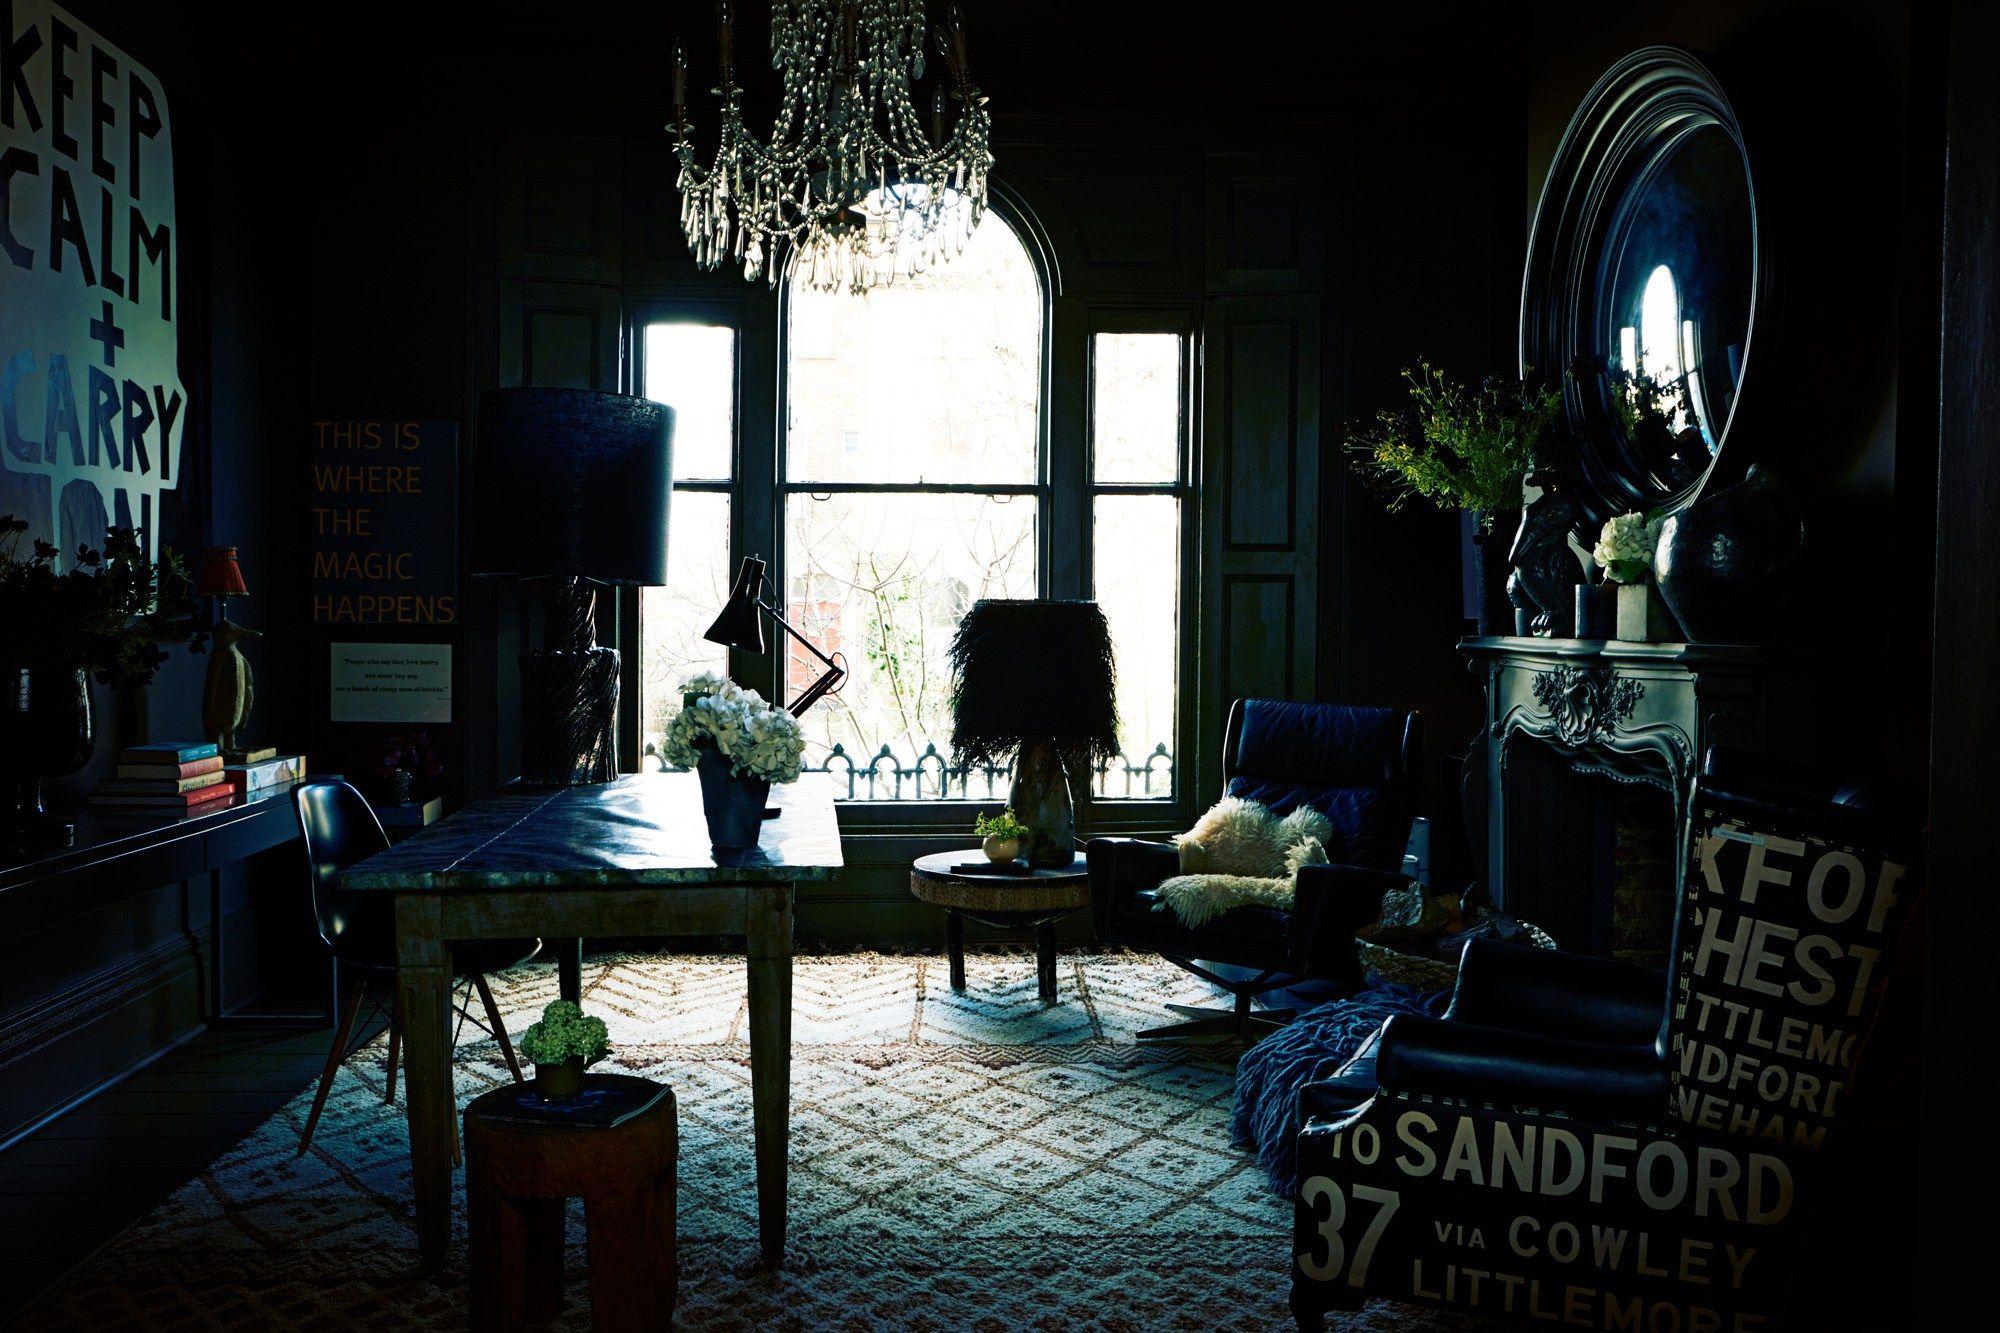 5 transforming tips House, home magazine, Abigail ahern